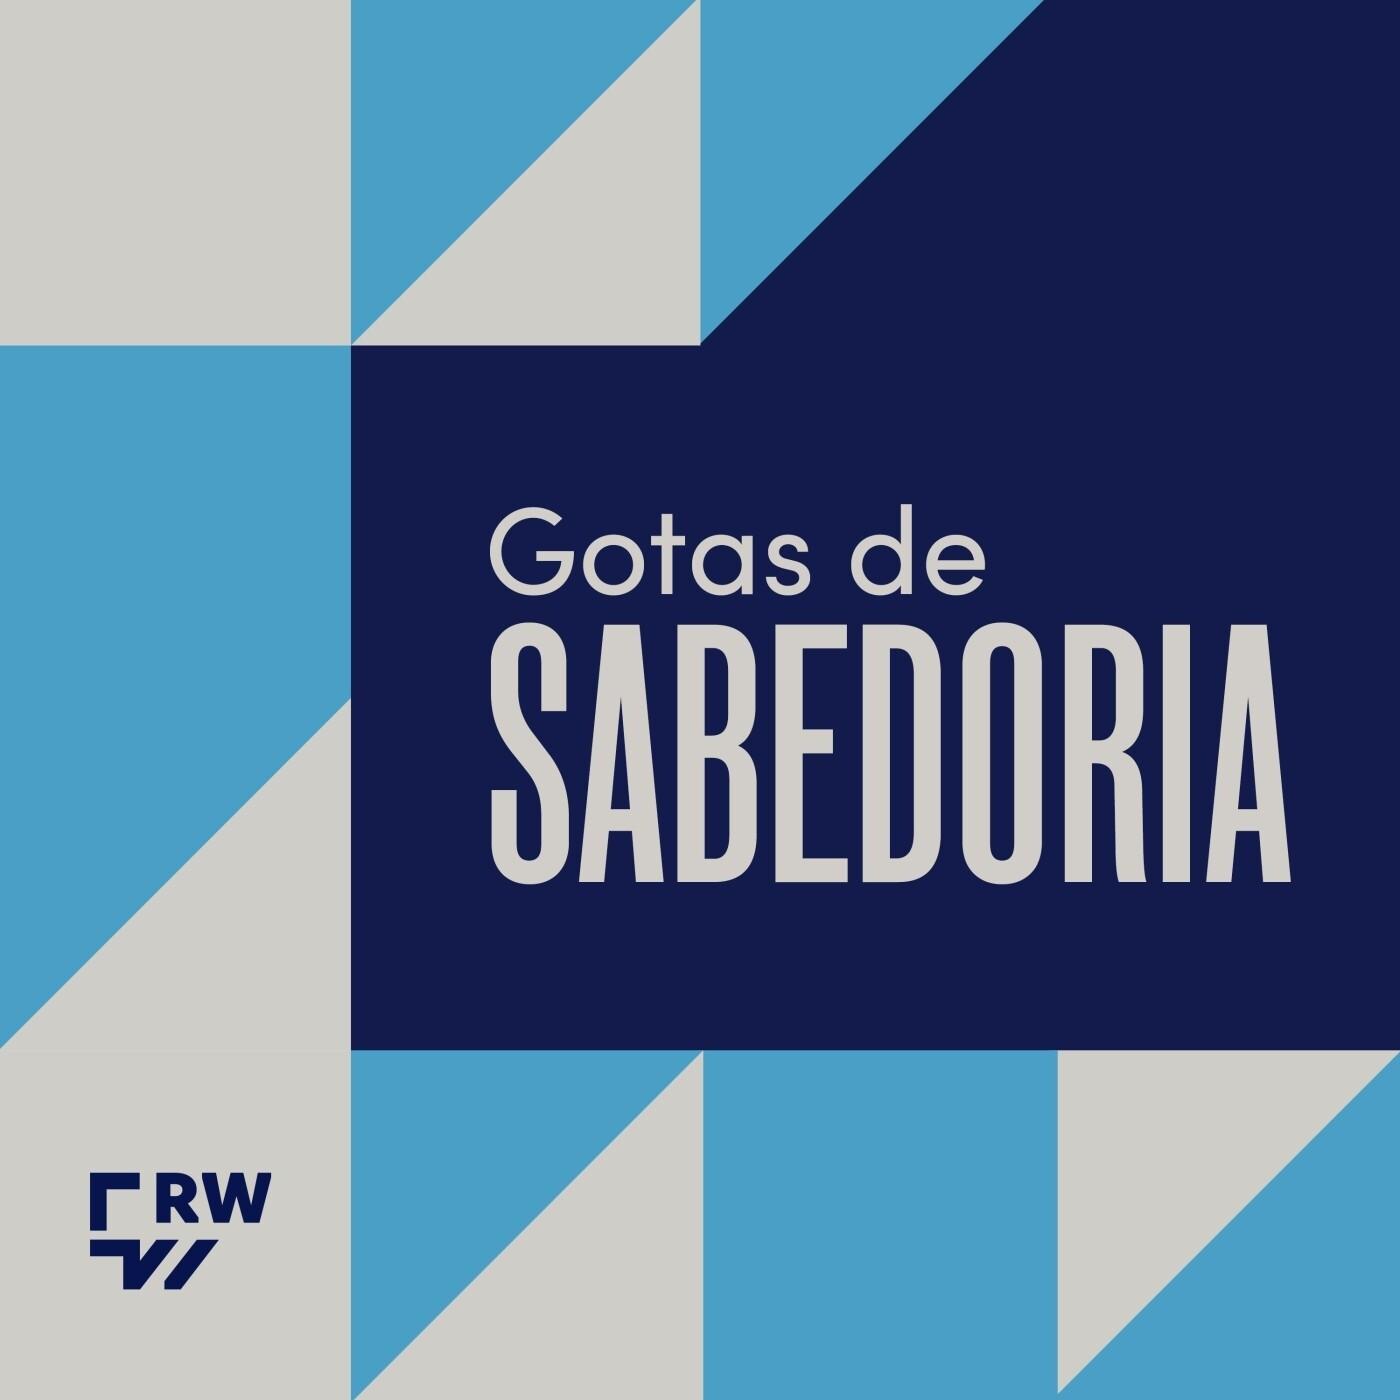 RW Cast - Agência Radioweb